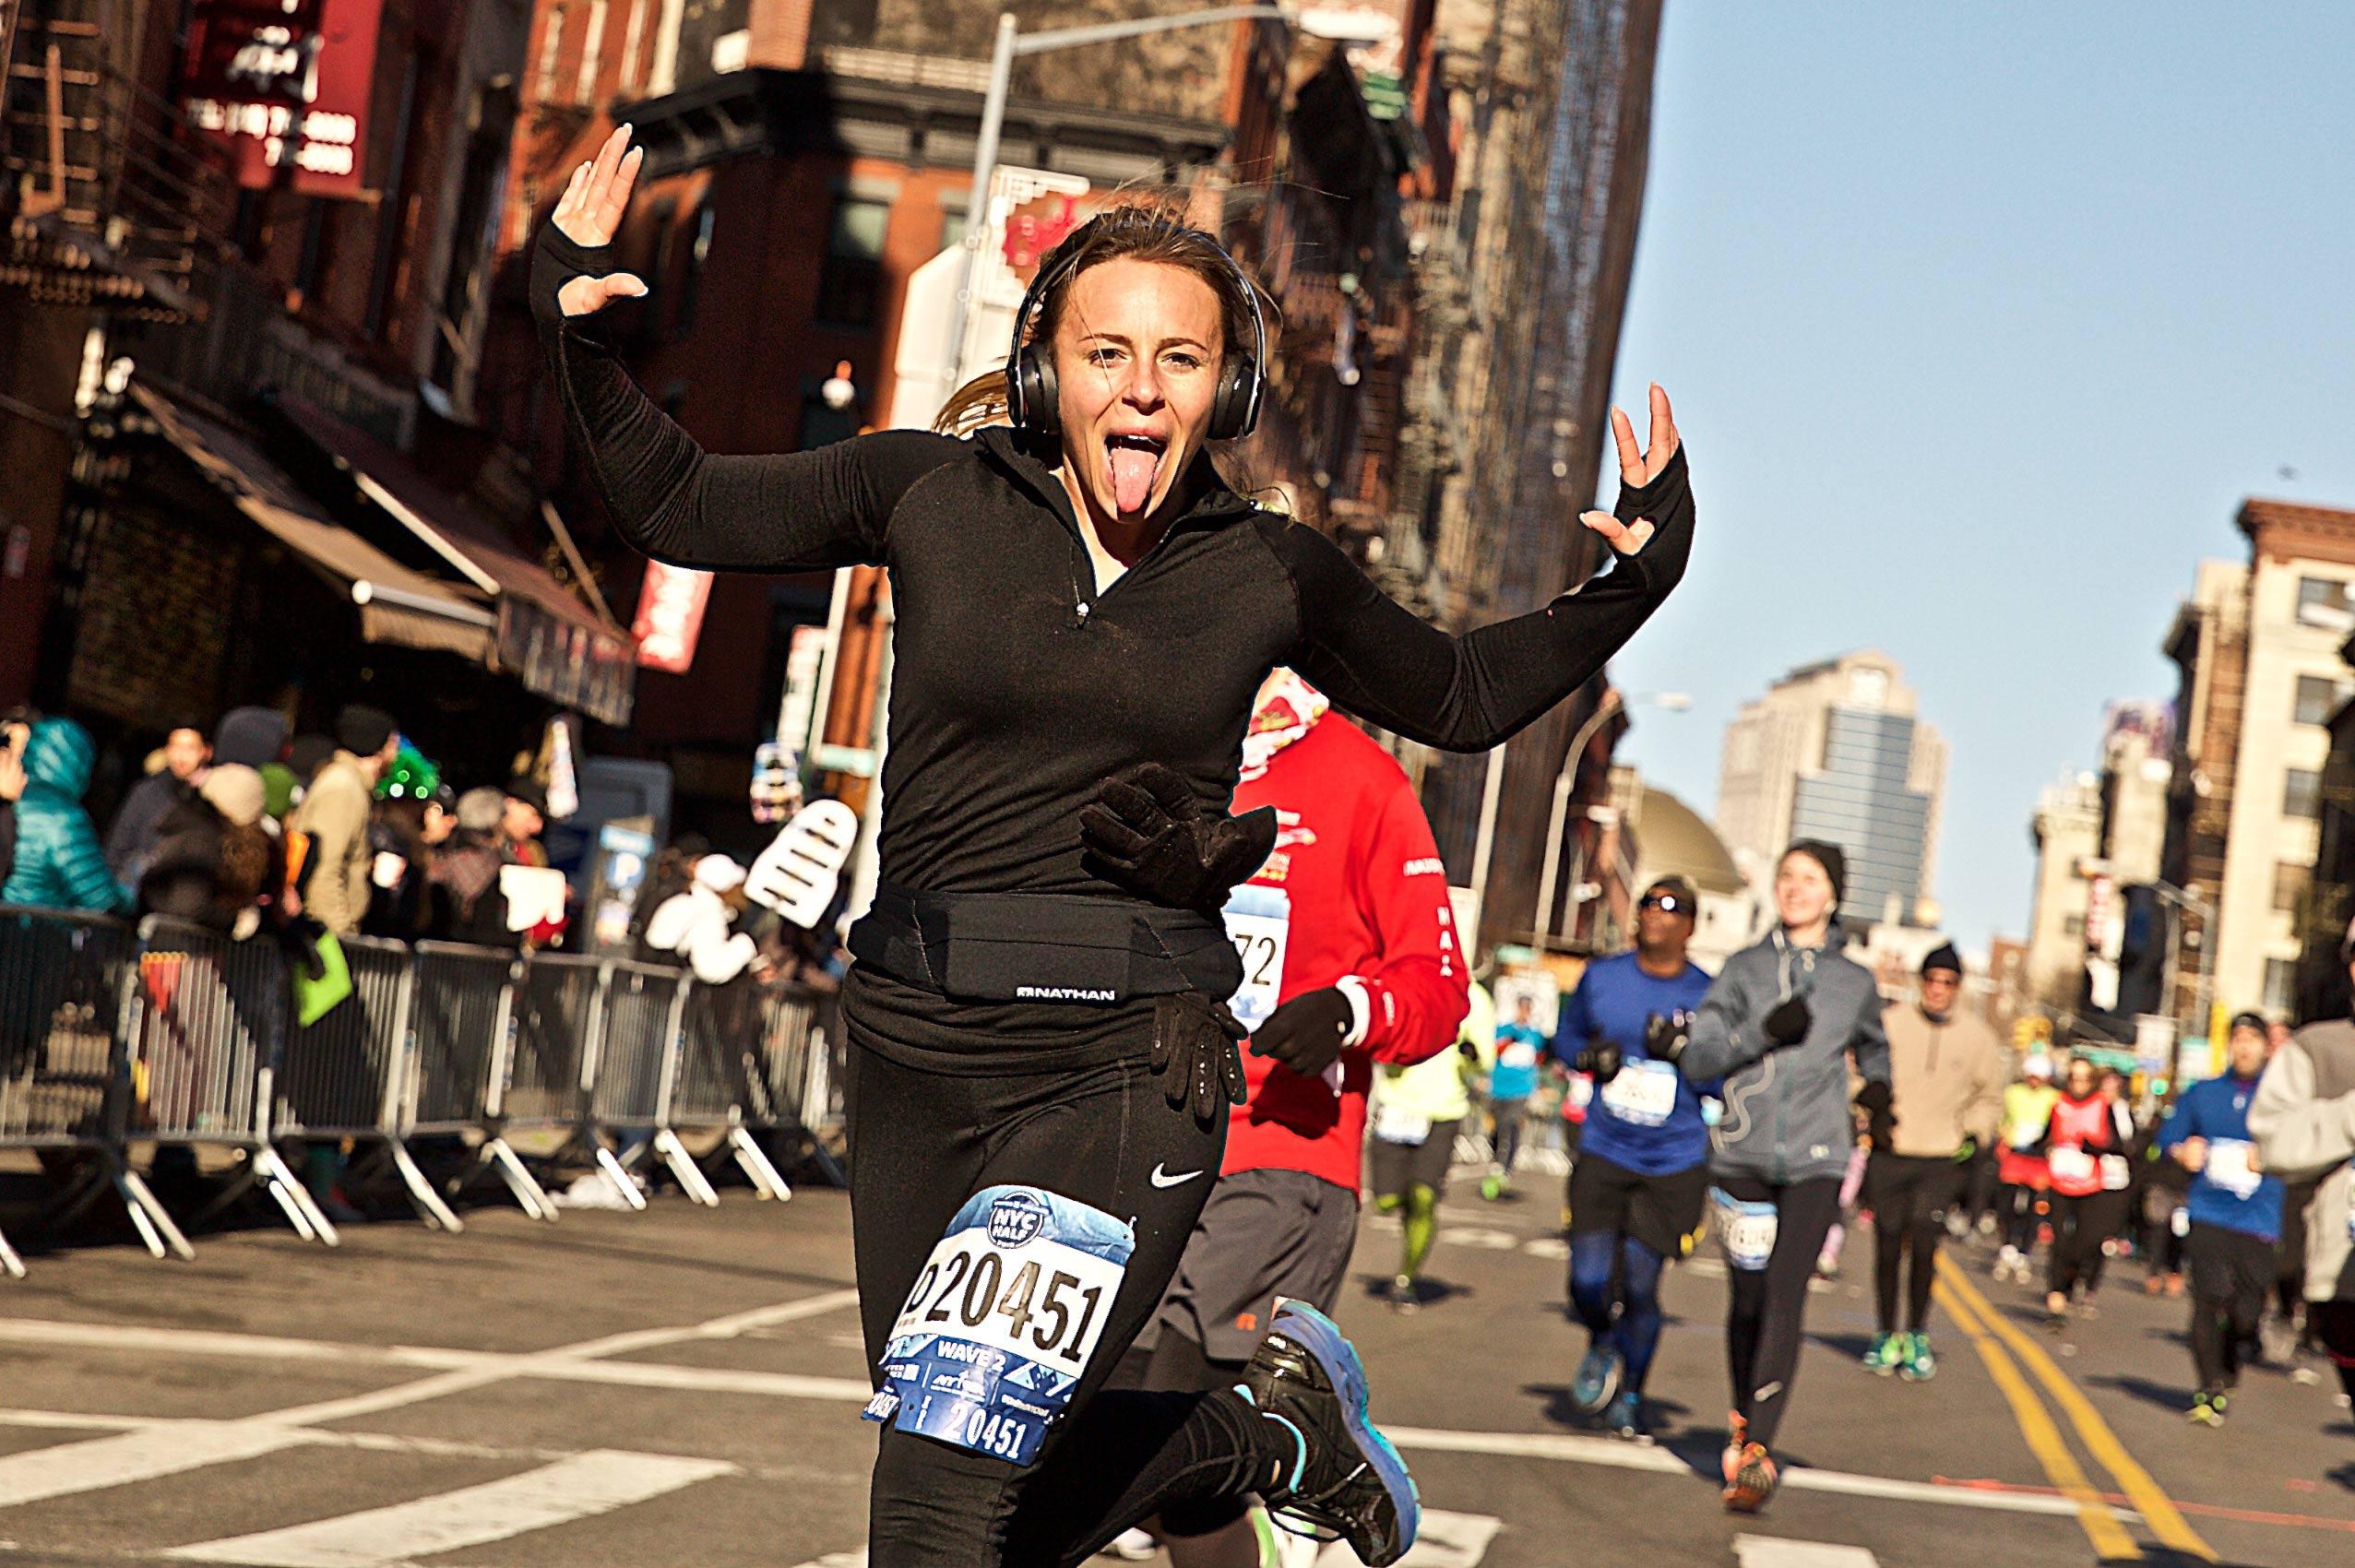 Woman Running the NYC Half Marathon